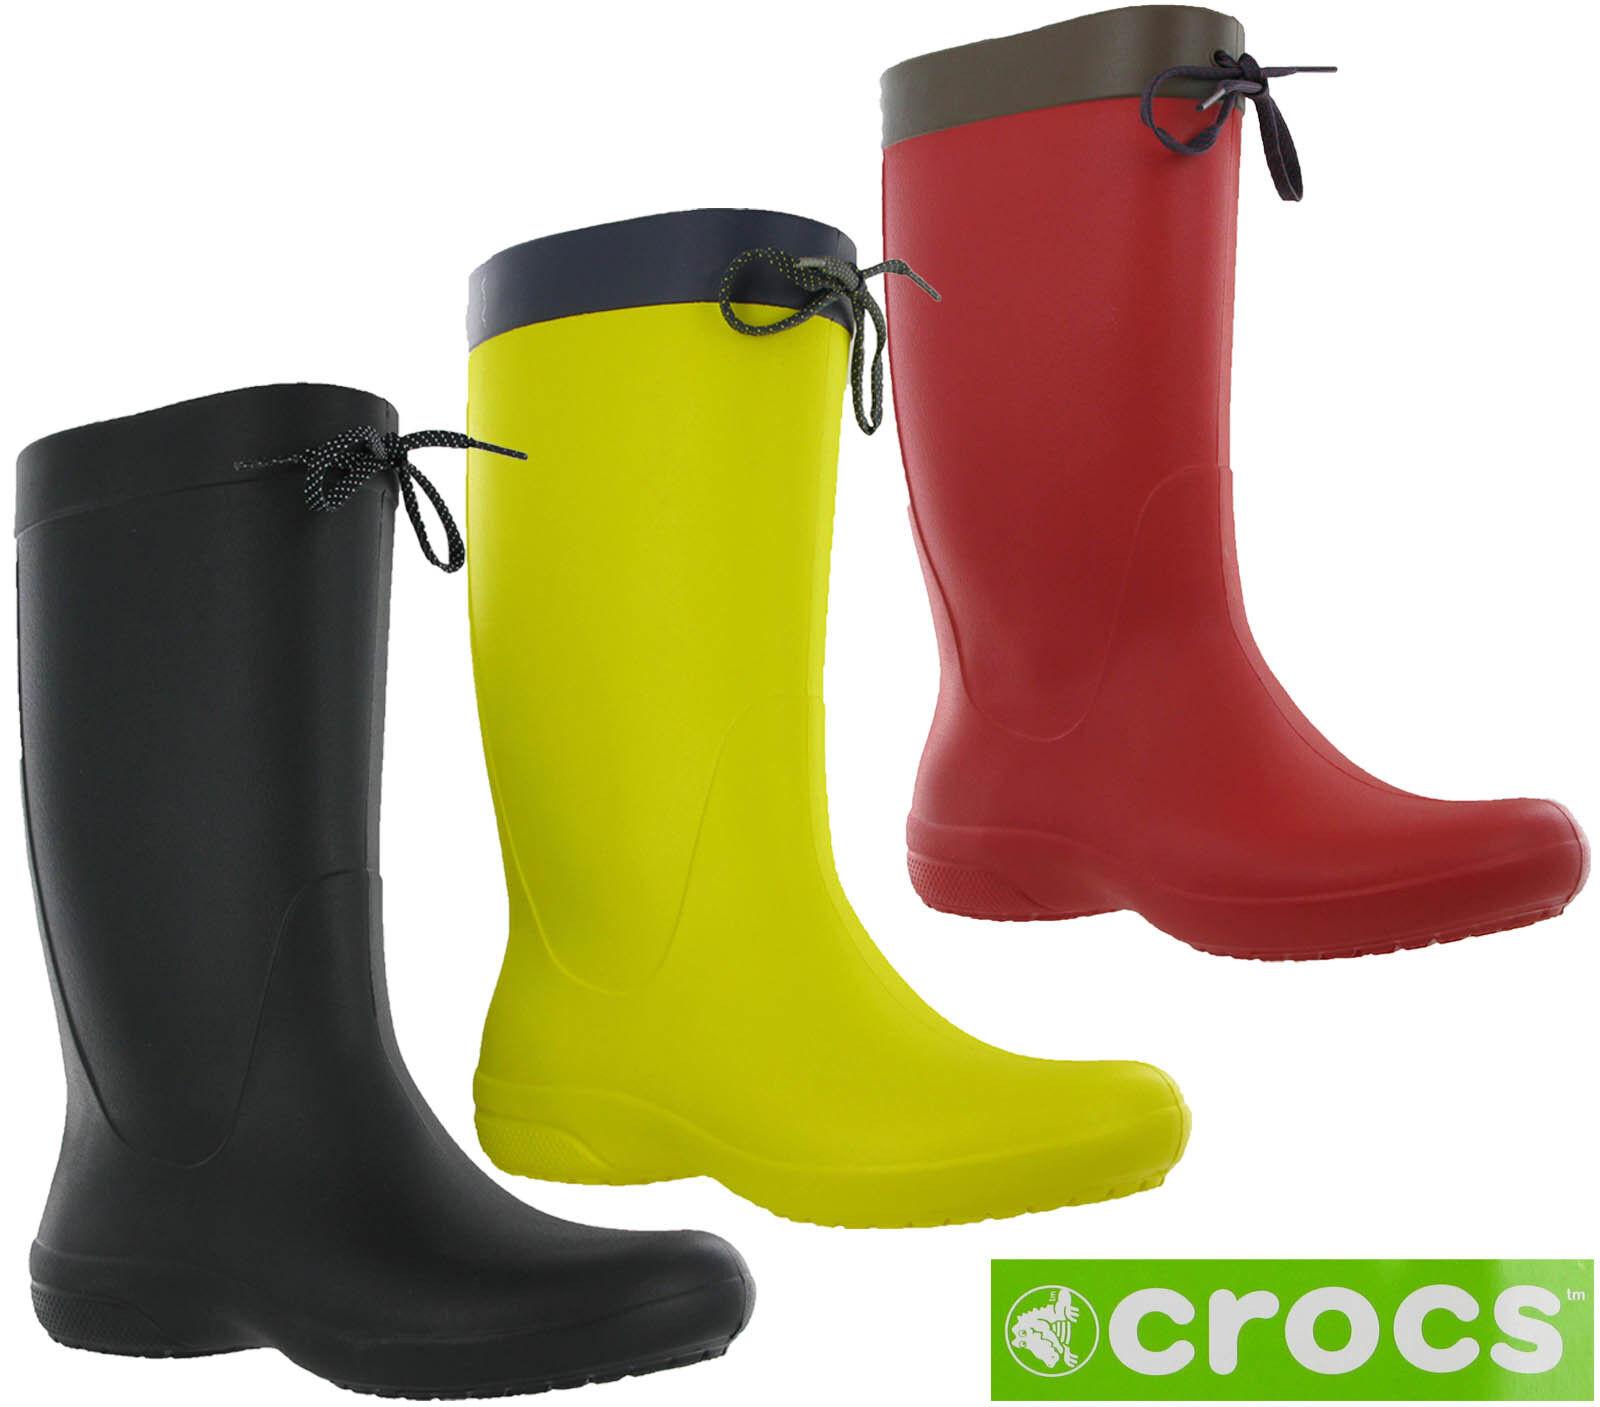 Crocs Botas Lluvia Freesail Agua Cargador Mujer De 3RjLcAq45S